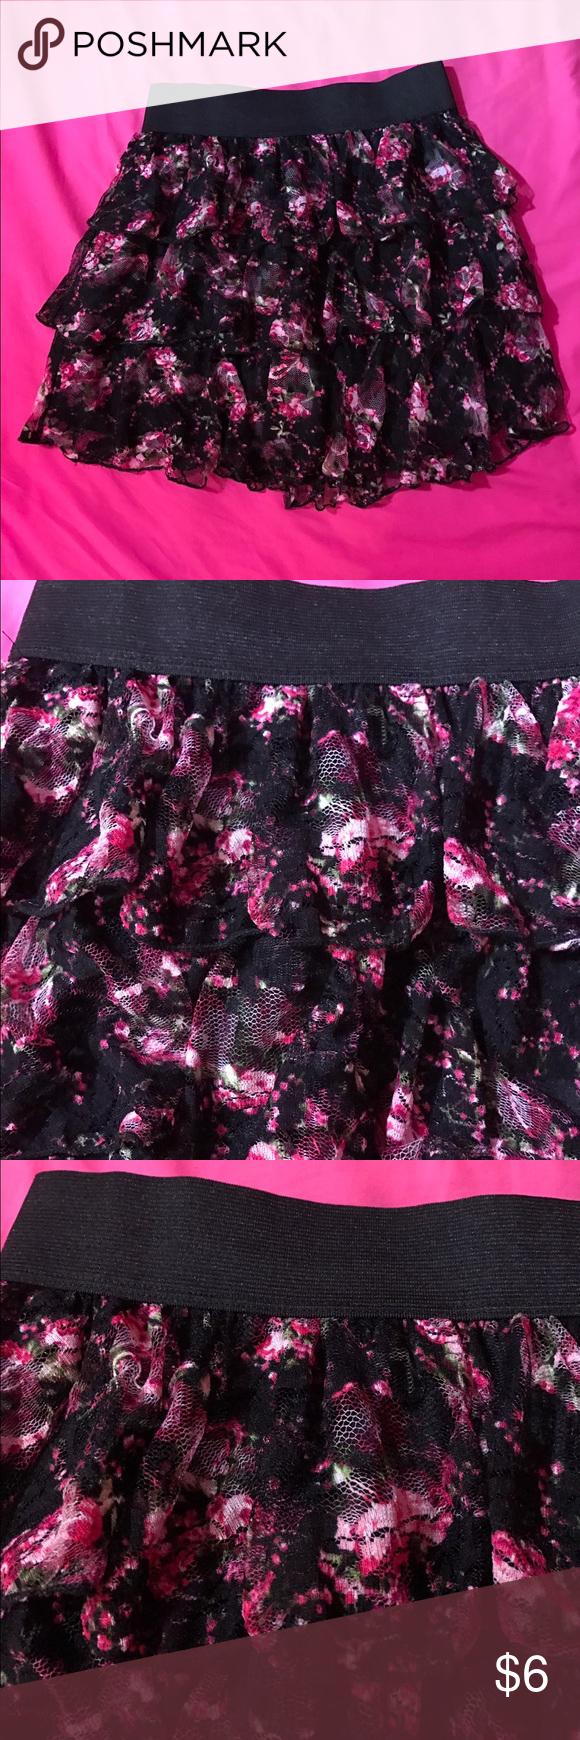 Selling this Deb skirt on Poshmark! My username is: shilts. #shopmycloset #poshmark #fashion #shopping #style #forsale #Deb #Dresses & Skirts